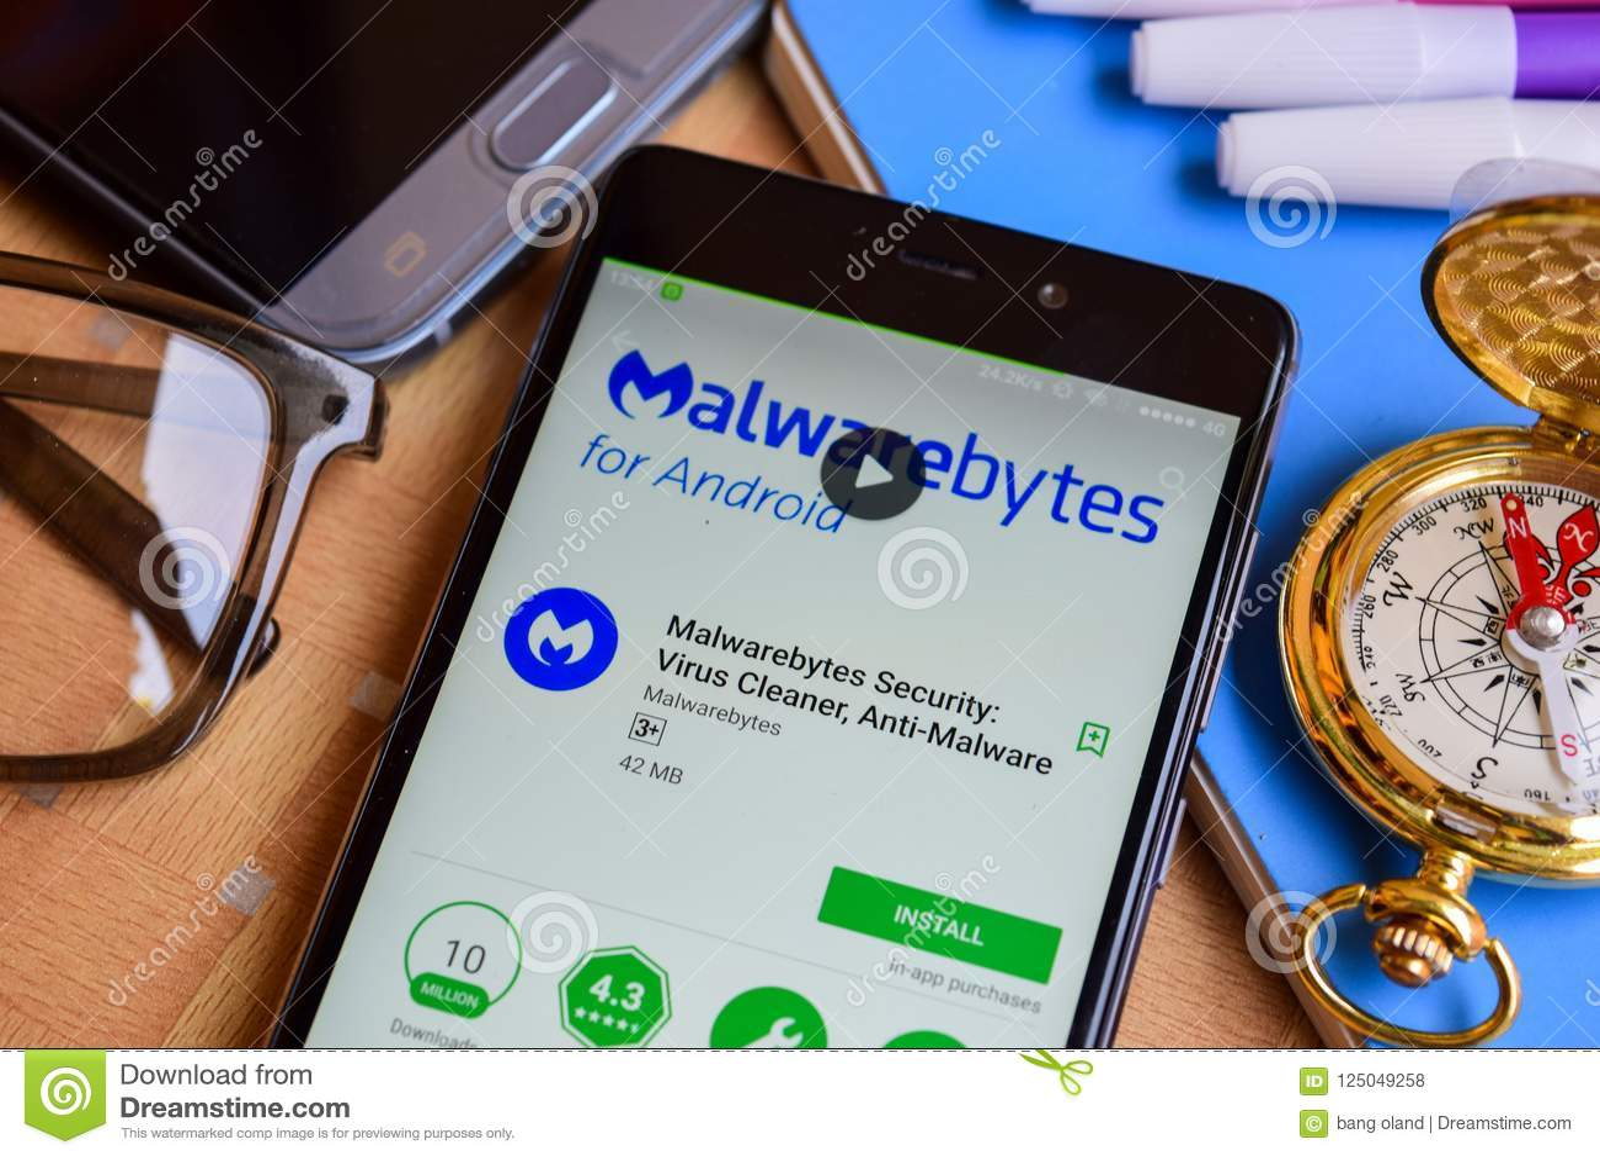 Malwarebytes Security: Virus Cleaner, Anti-Malware Dev